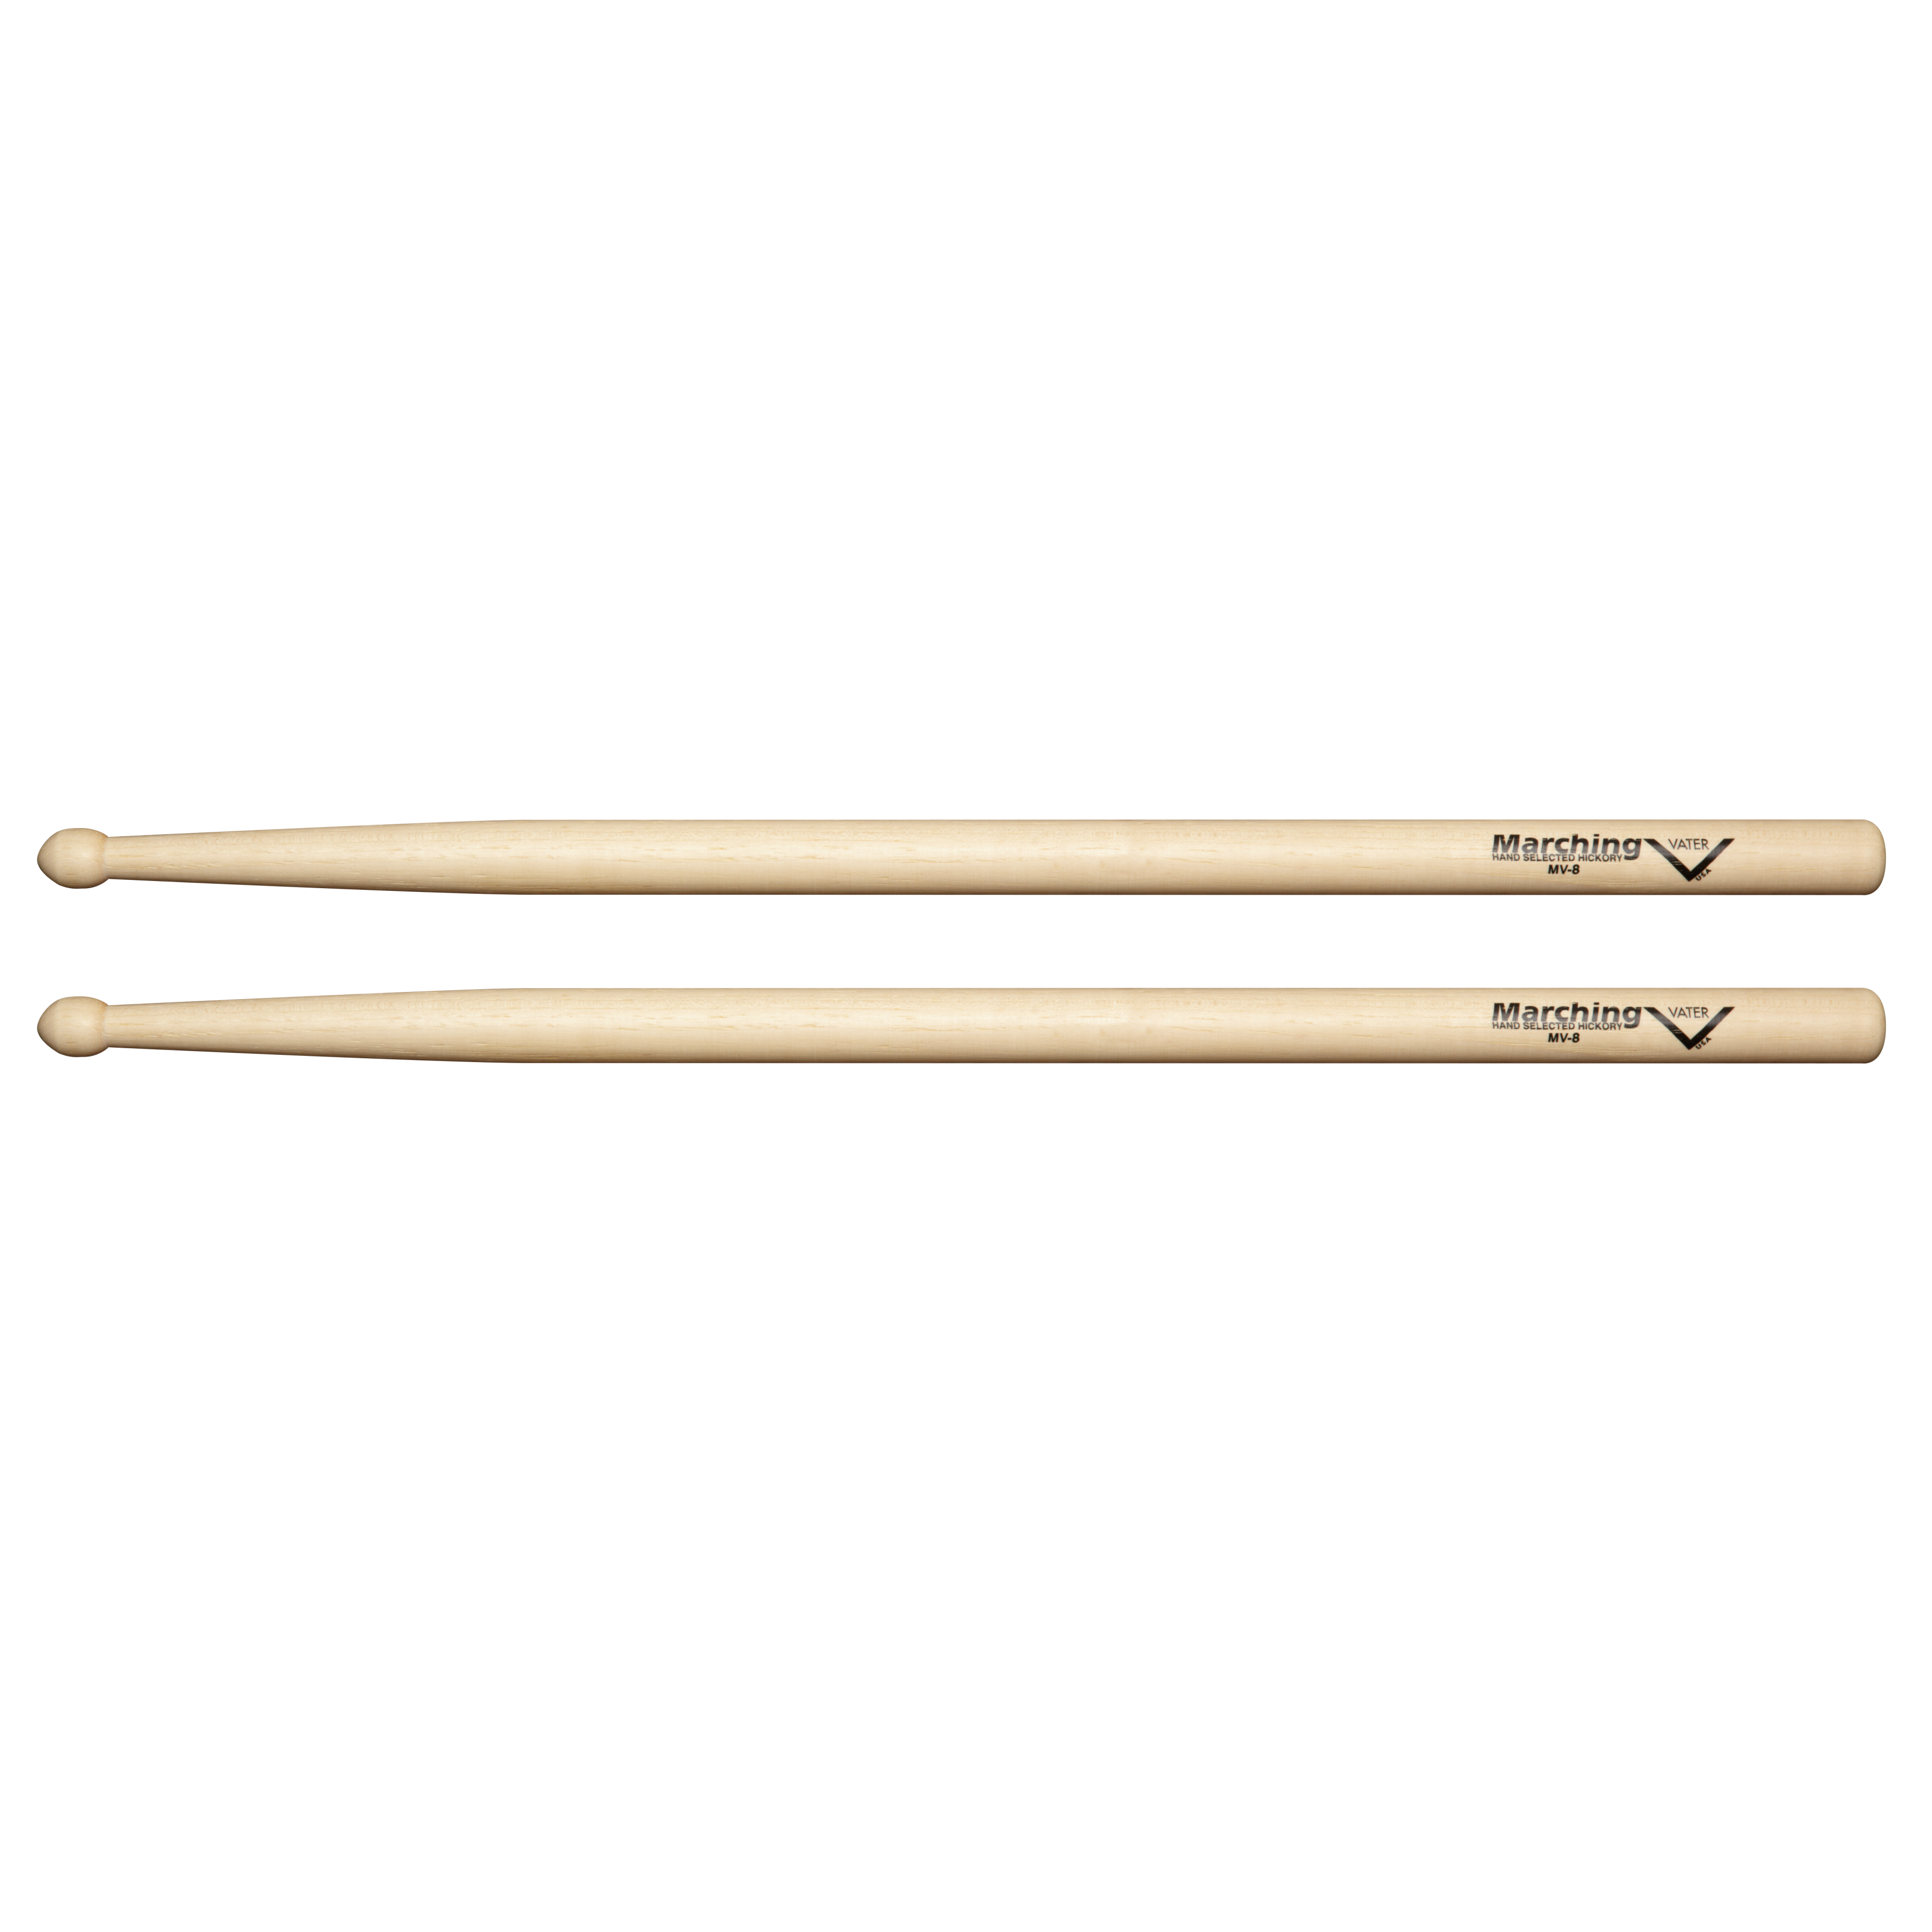 vater vat mv8 marching drum sticks with rounded acorn tip pair musical instruments. Black Bedroom Furniture Sets. Home Design Ideas